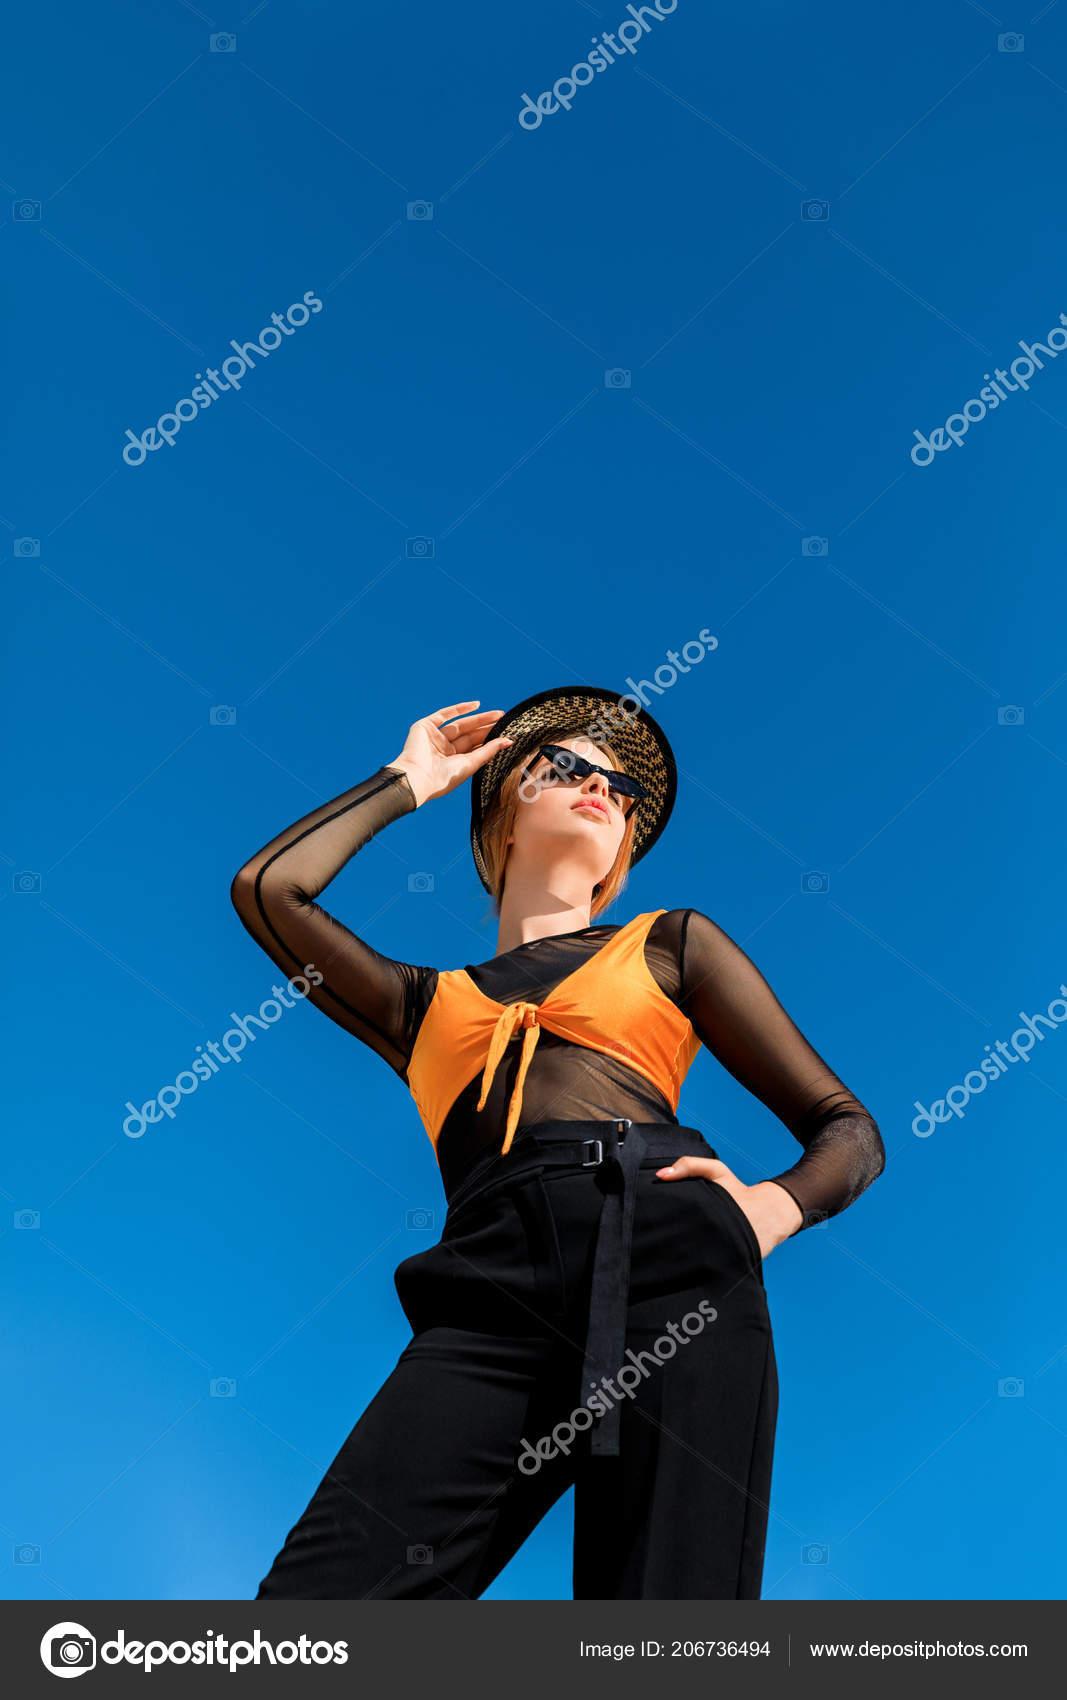 3bc12fd62d Κάτω Όψη Του Κοριτσιού Που Θέτουν Μοντέρνα Γυαλιά Ηλίου Και– εικόνα αρχείου